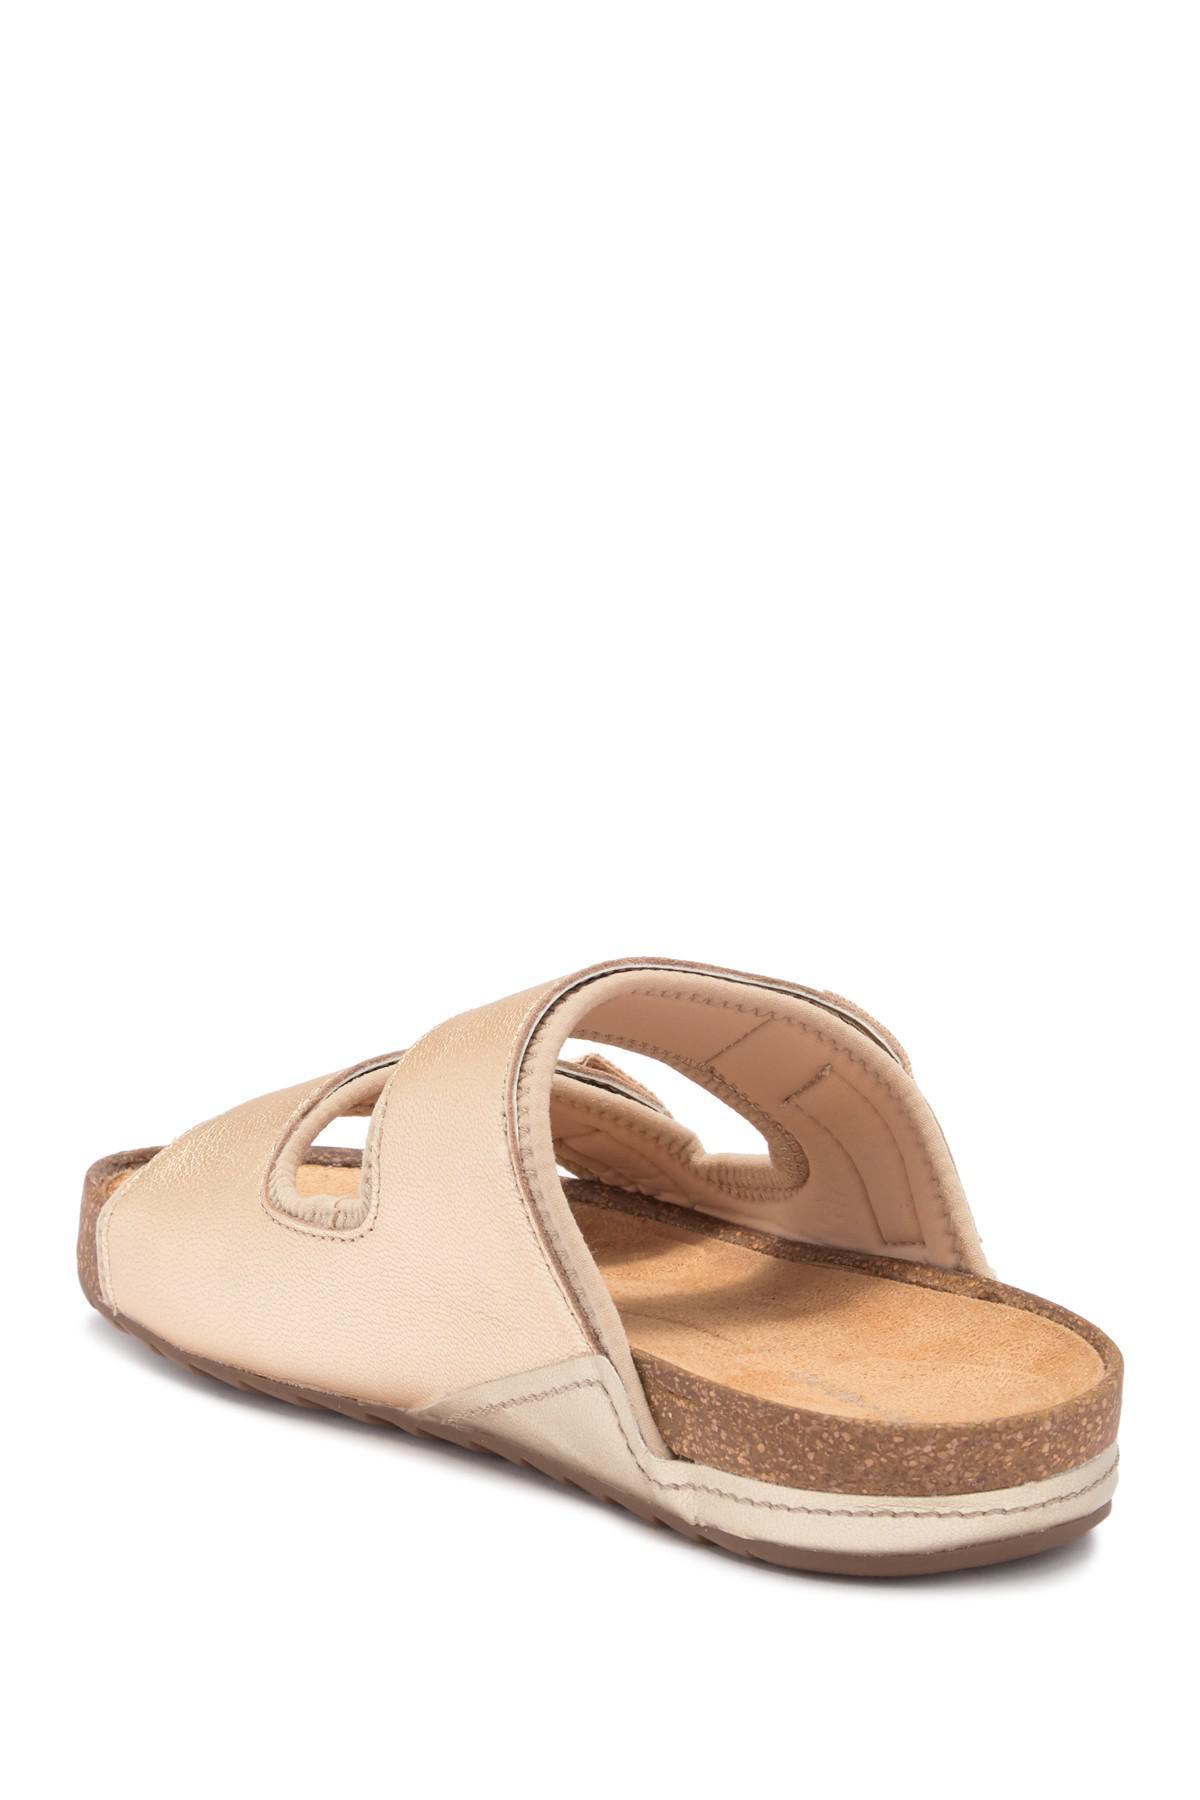 8b7a9c55de79 Lyst - Easy Spirit Peace Slide Sandal - Wide Width Available